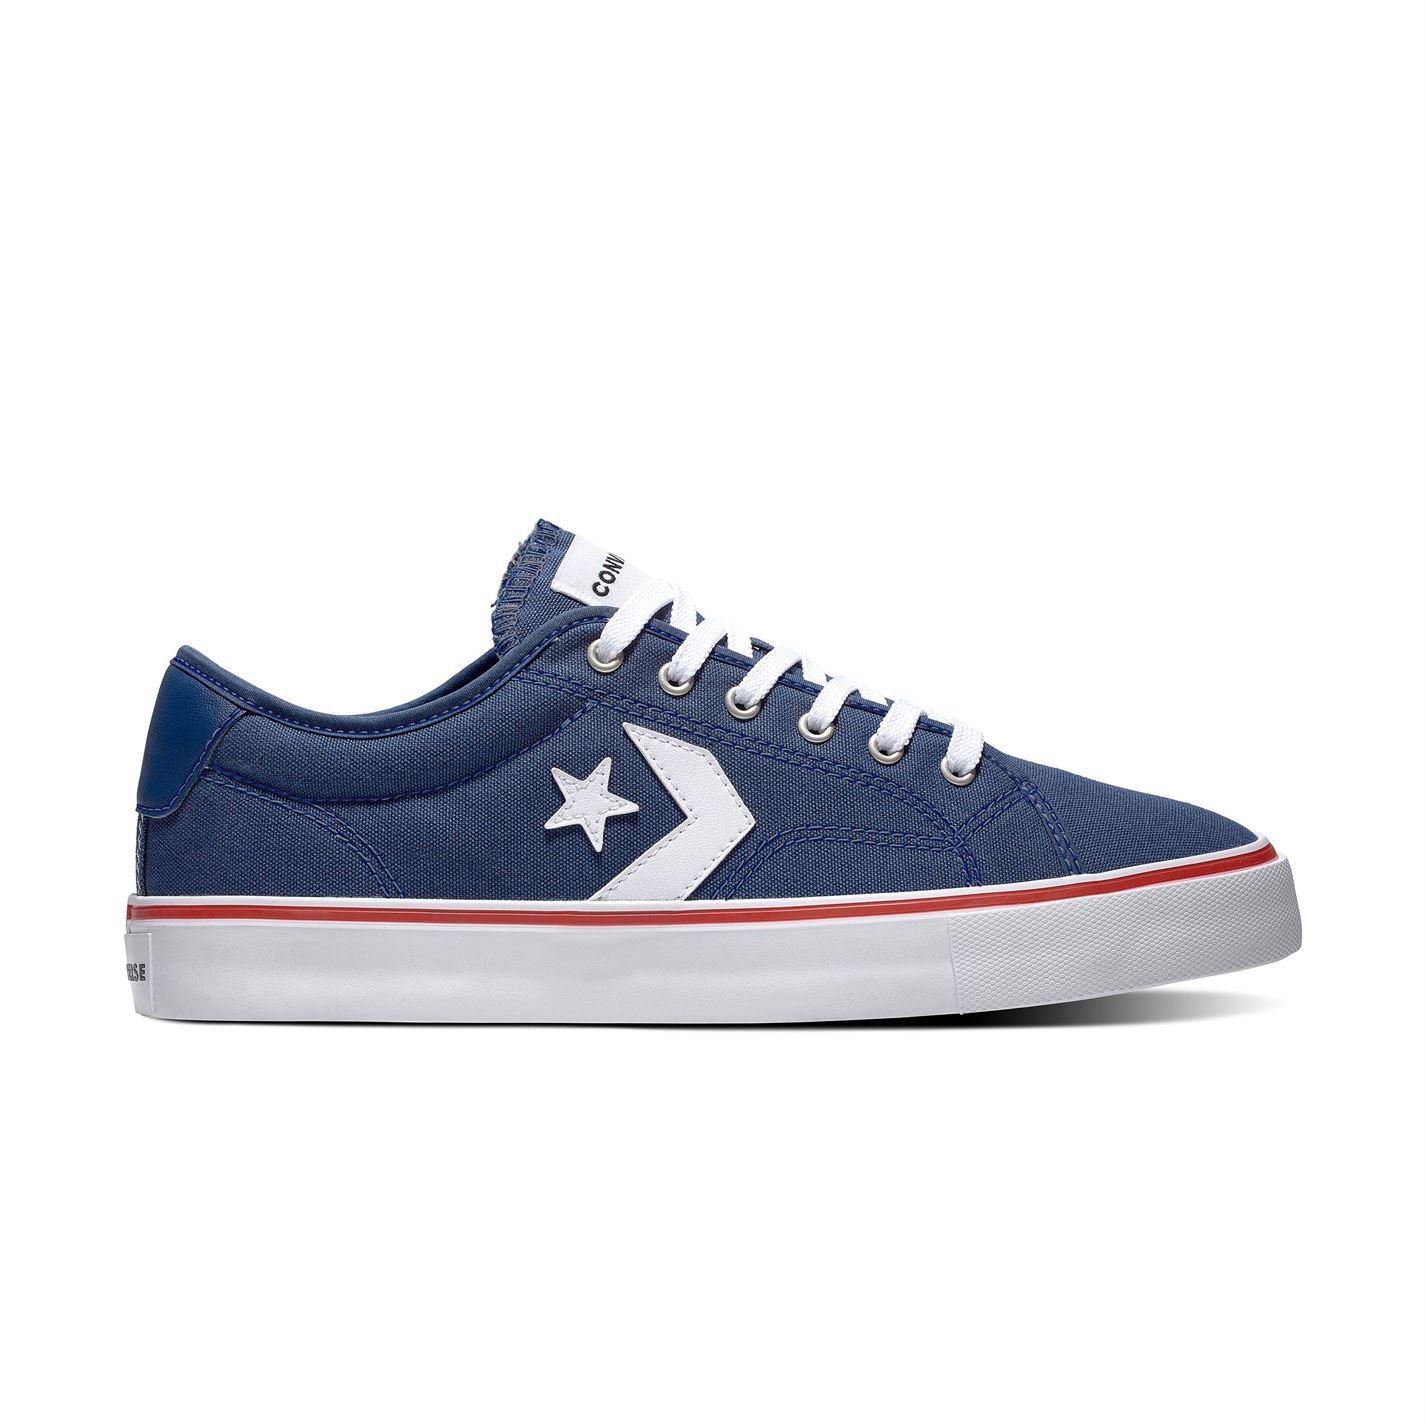 Converse-Ox-REPLAY-Baskets-Pour-Homme-Chaussures-De-Loisirs-Chaussures-Baskets miniature 16